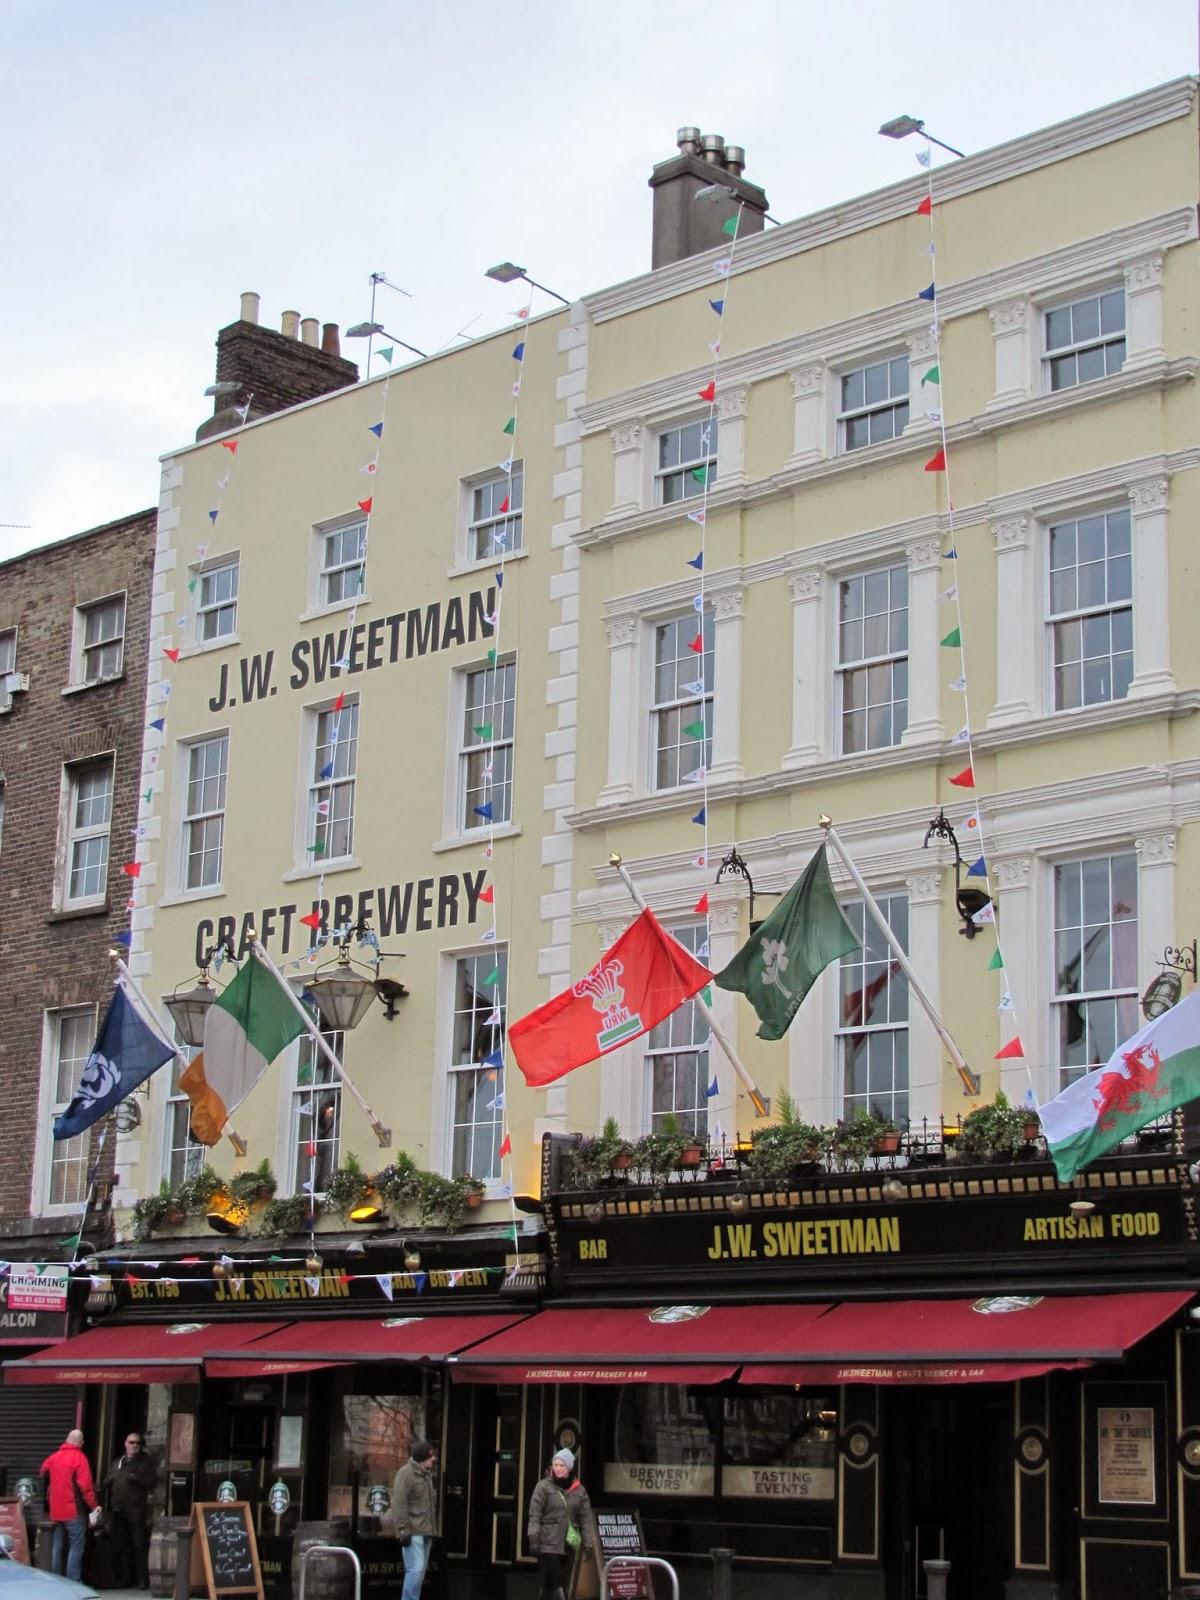 J.W. Sweetman Brew Pub Dublin, Ireland